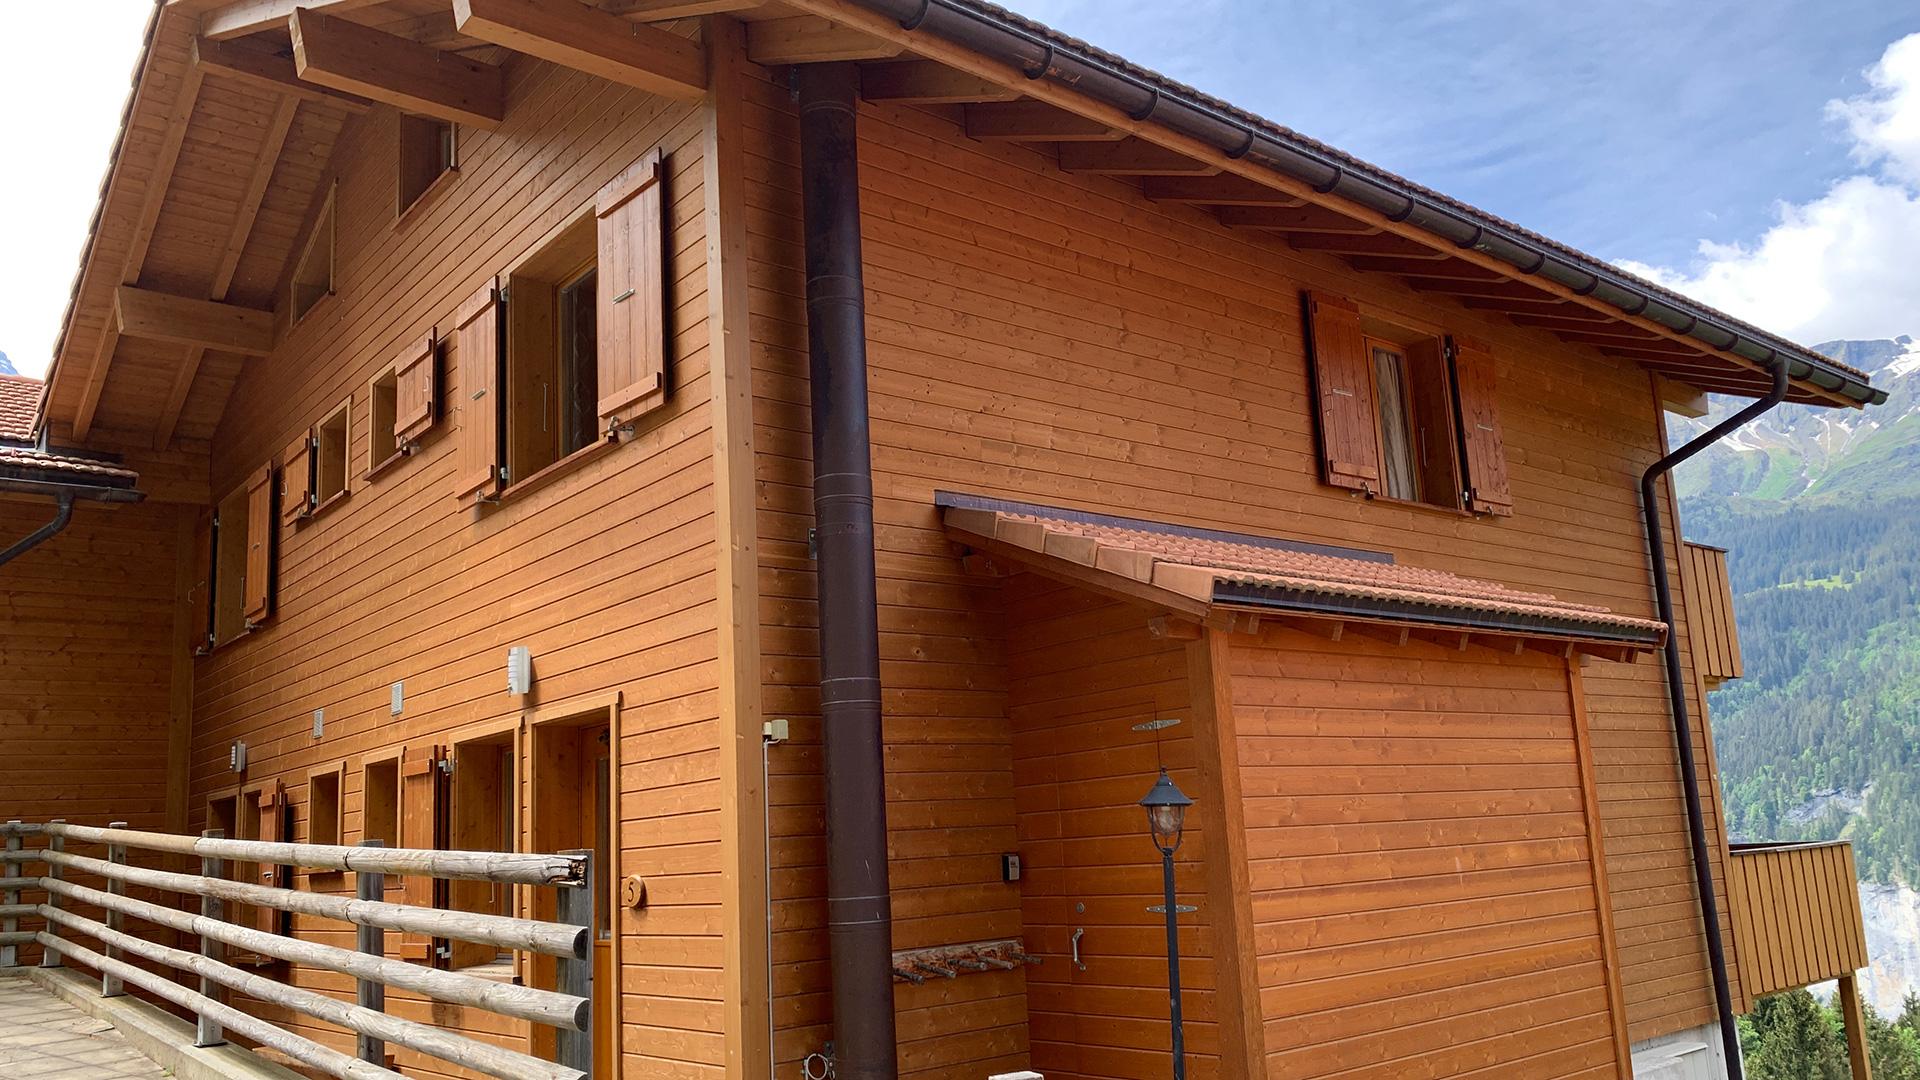 Racers Retreat 5 Chalet, Switzerland